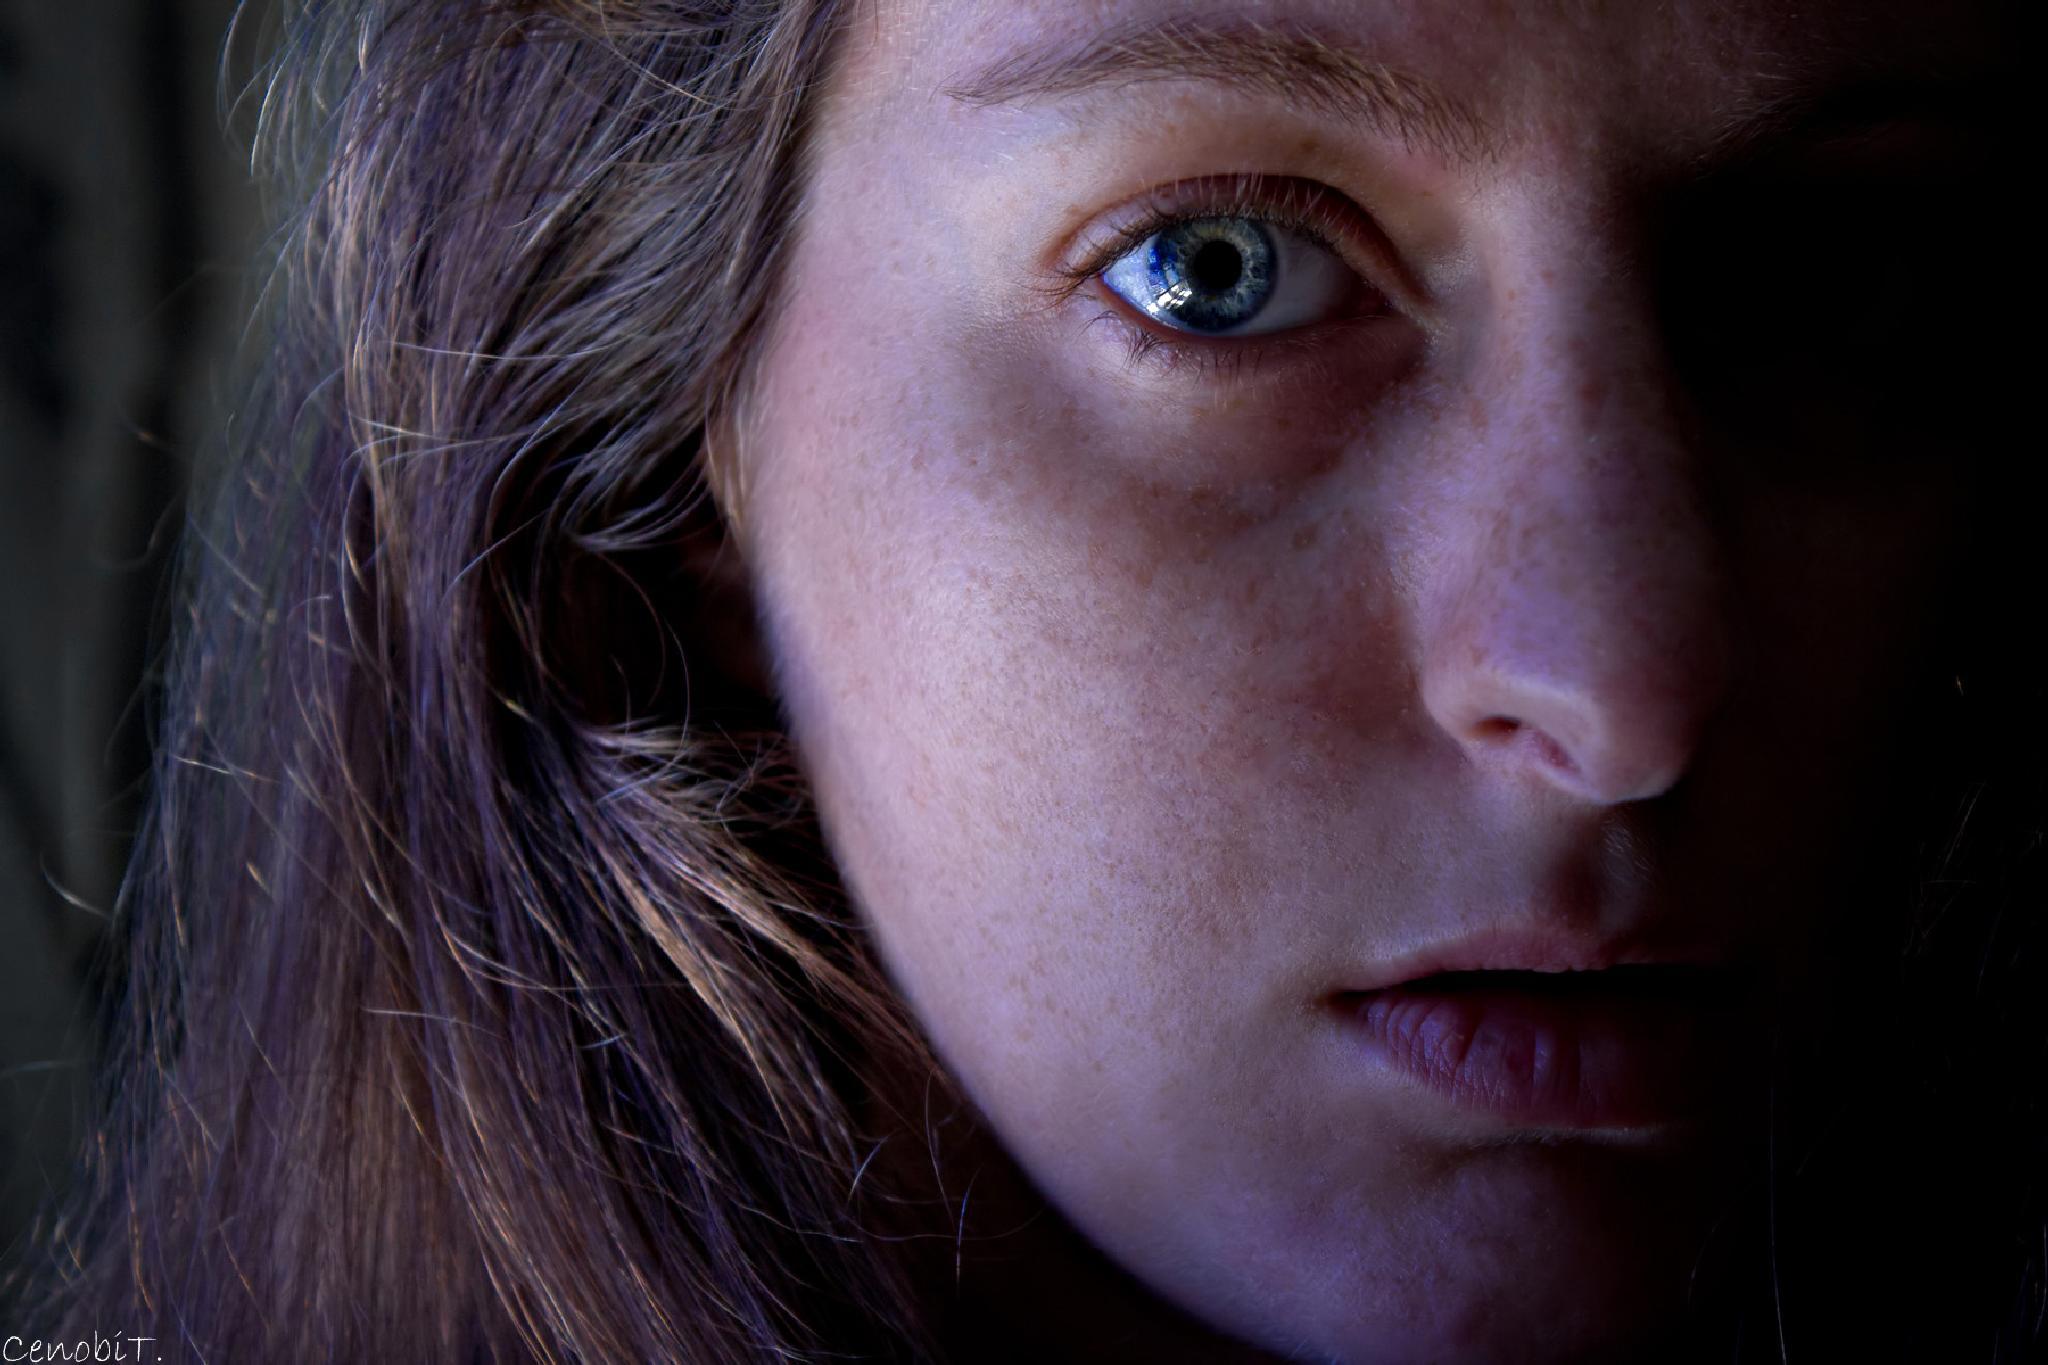 Season of Freckles by Tina Zdilar